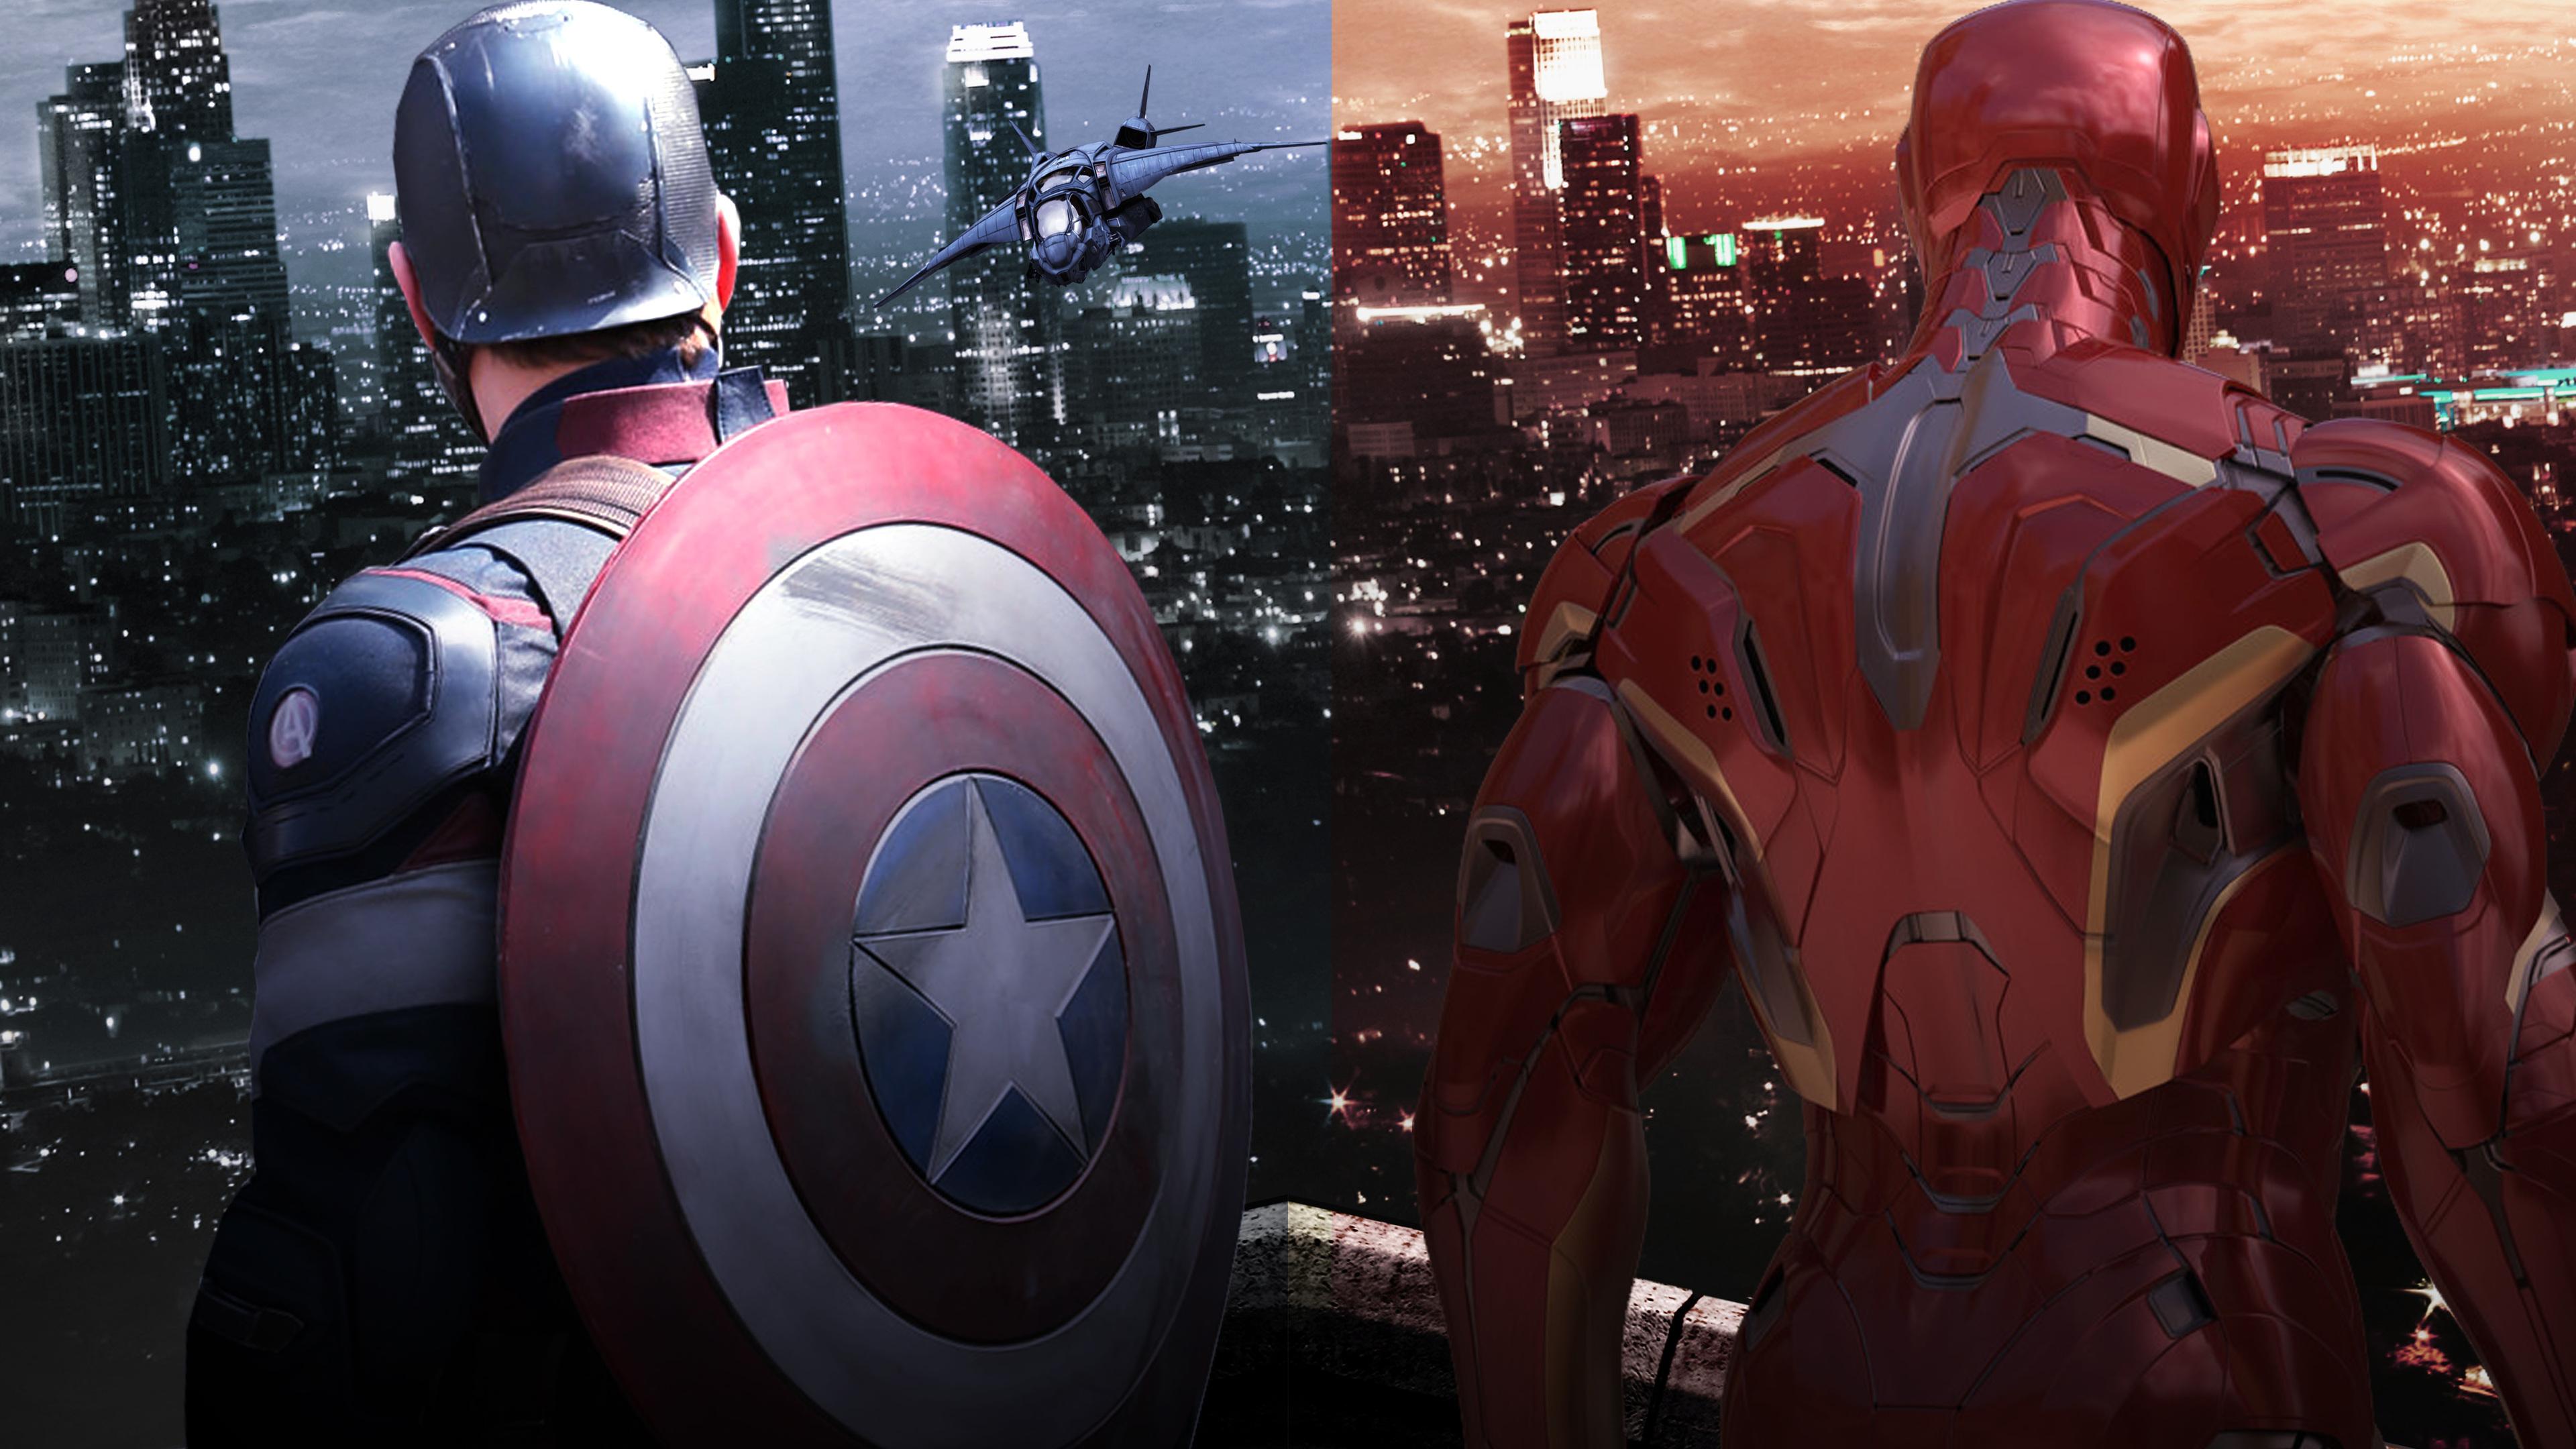 captain america shield and iron man 1536521551 - Captain America Shield And Iron Man - superheroes wallpapers, shield wallpapers, iron man wallpapers, hd-wallpapers, captain america wallpapers, artwork wallpapers, artist wallpapers, 4k-wallpapers